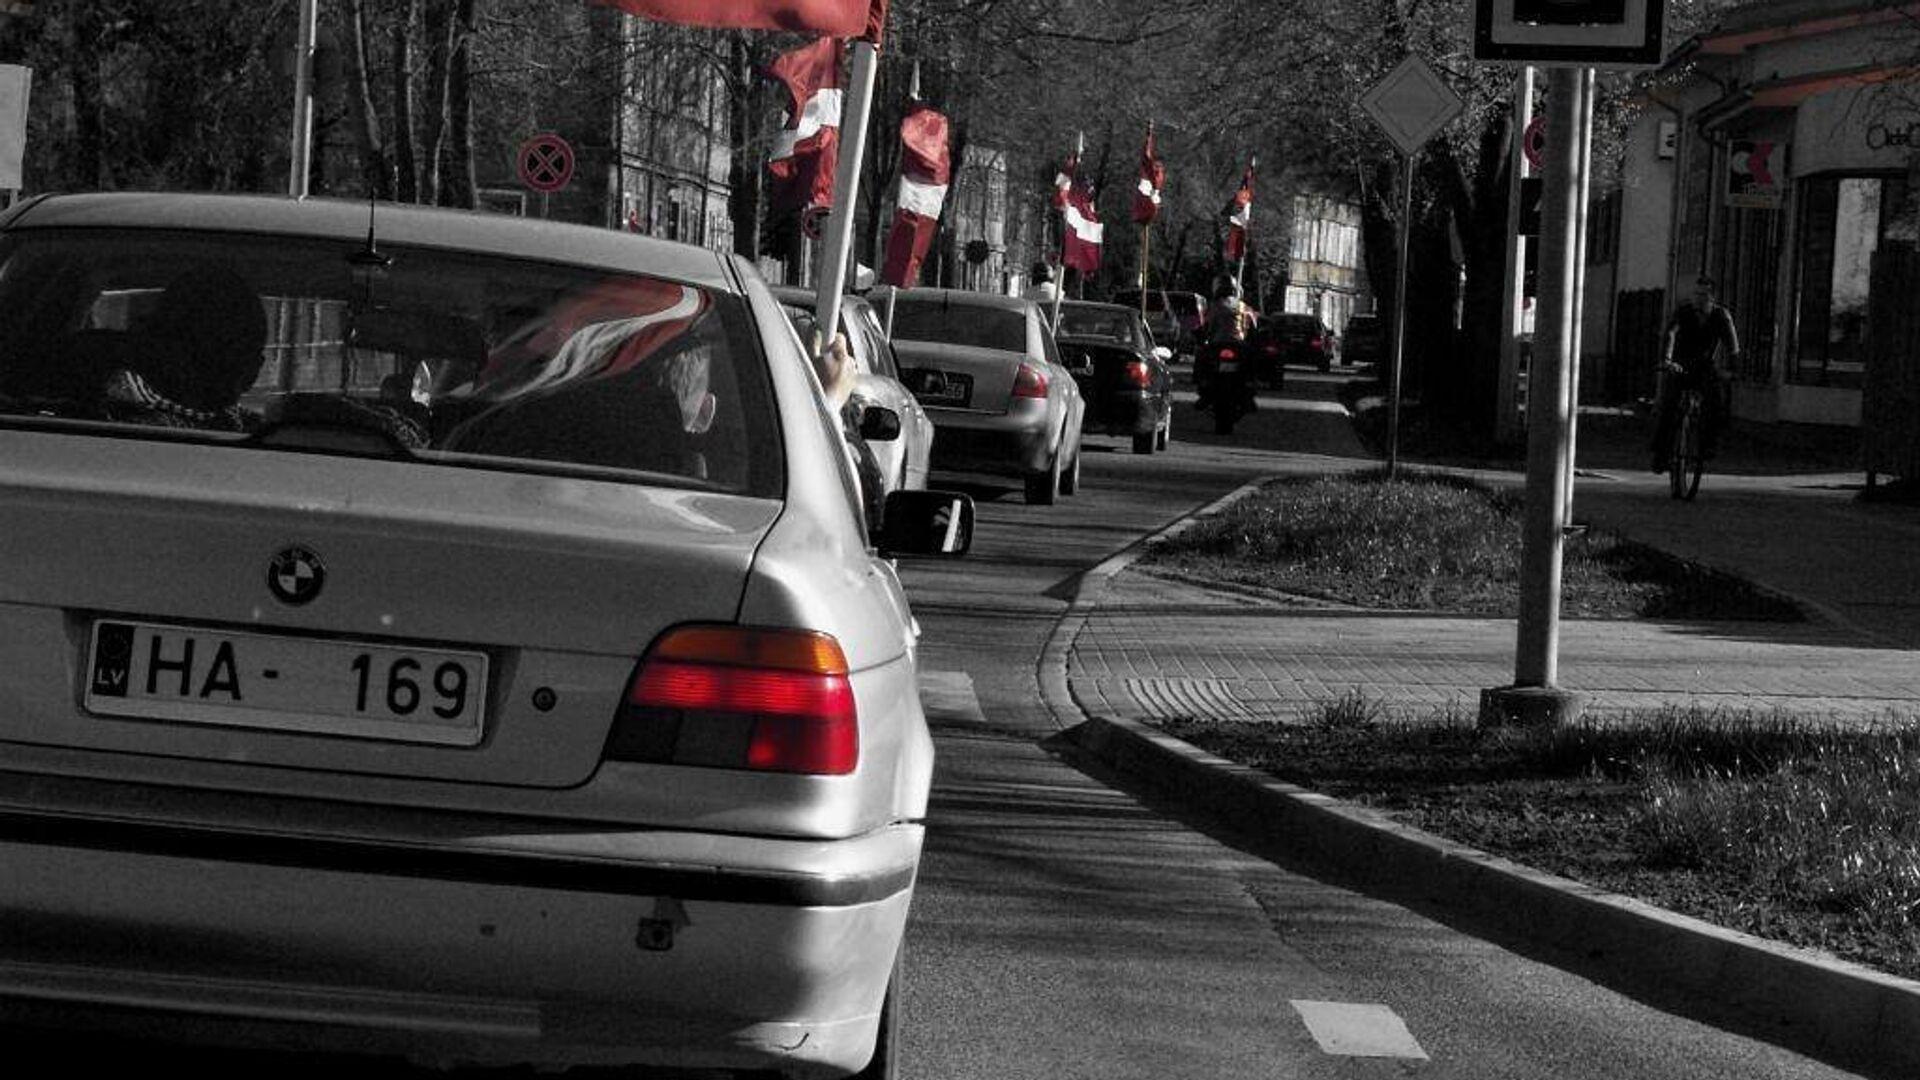 Автопробег с латвийскими флагами в Лиепае - Sputnik Латвия, 1920, 02.09.2021